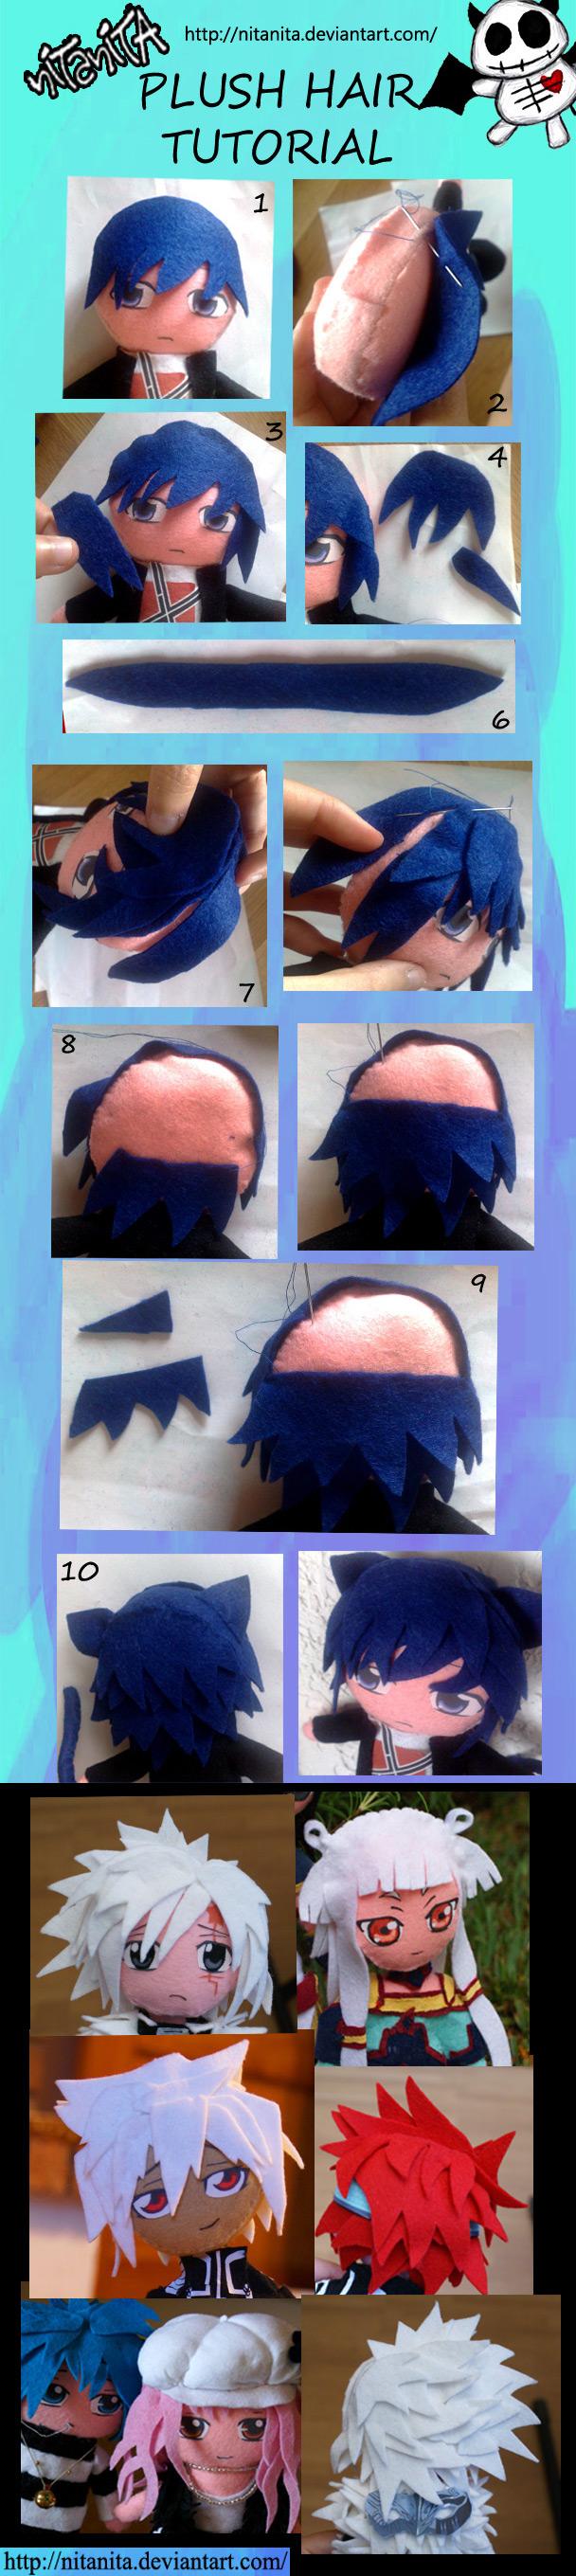 Plush Hair tutorial by nitanita